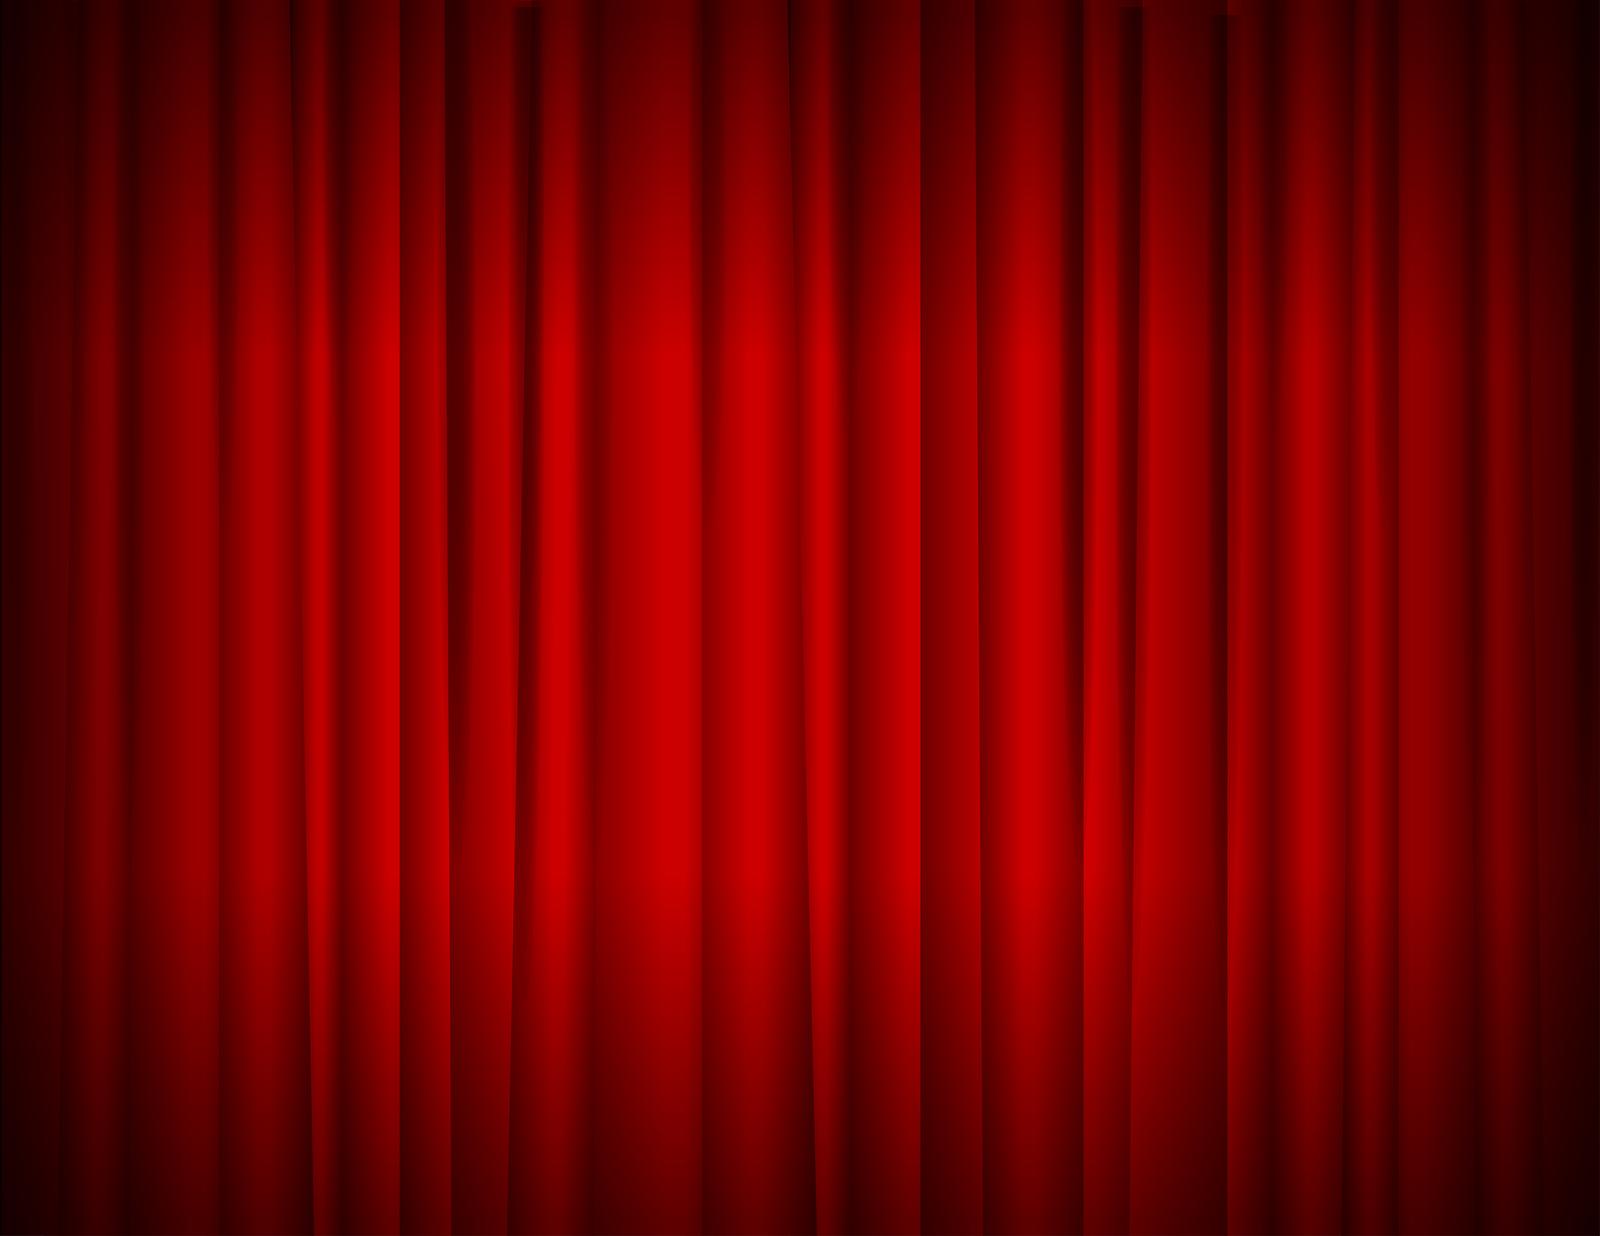 bigstock--205533028 curtains.jpg